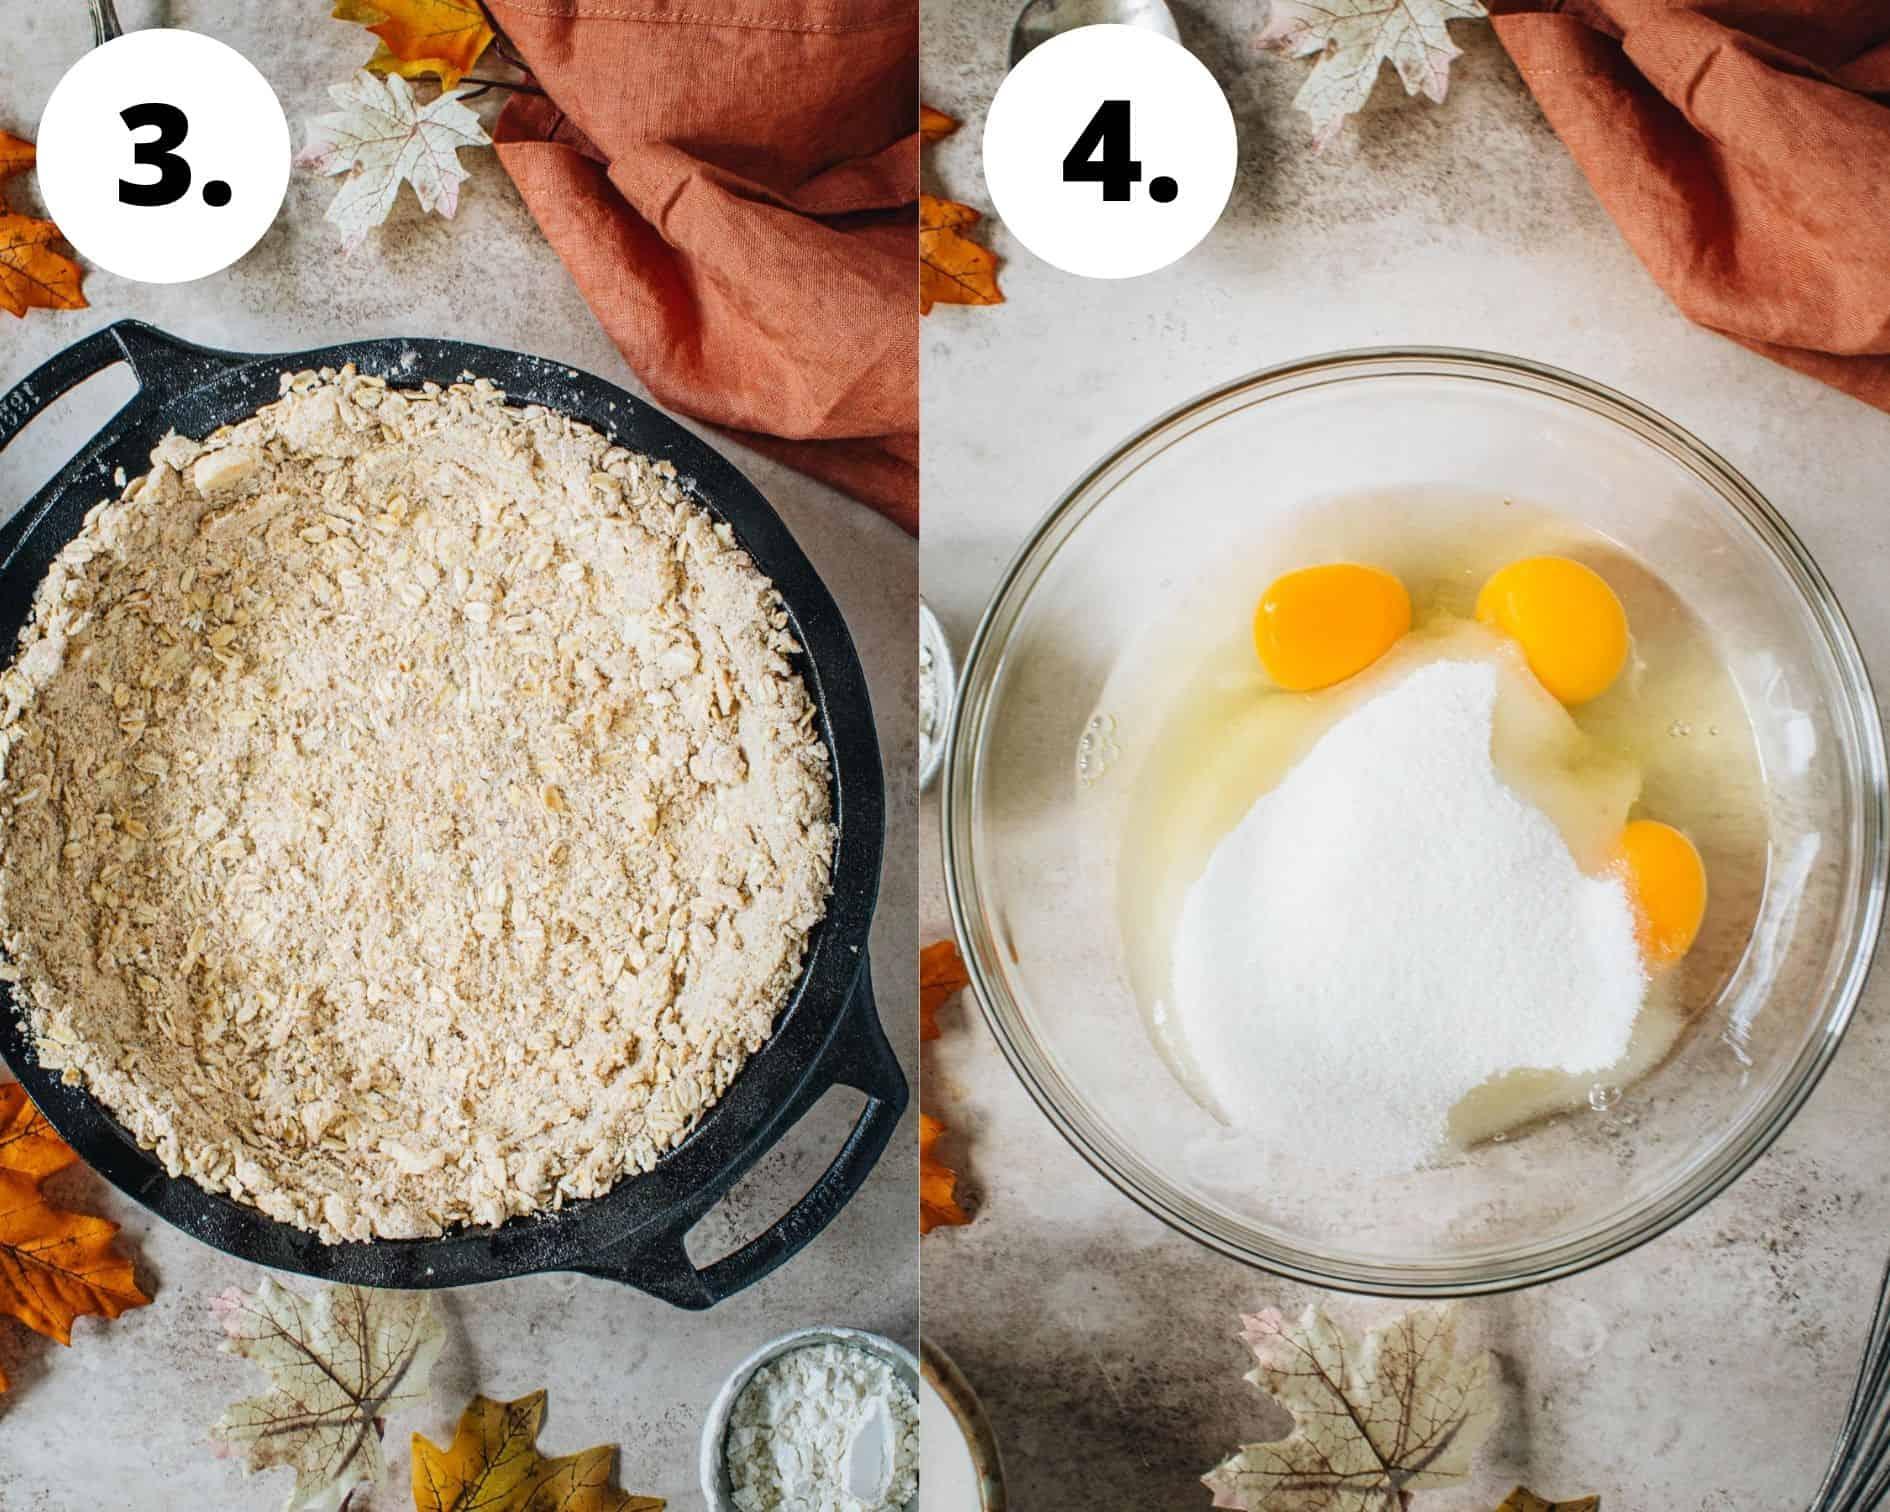 Pumpkin crisp process steps 3 and 4.